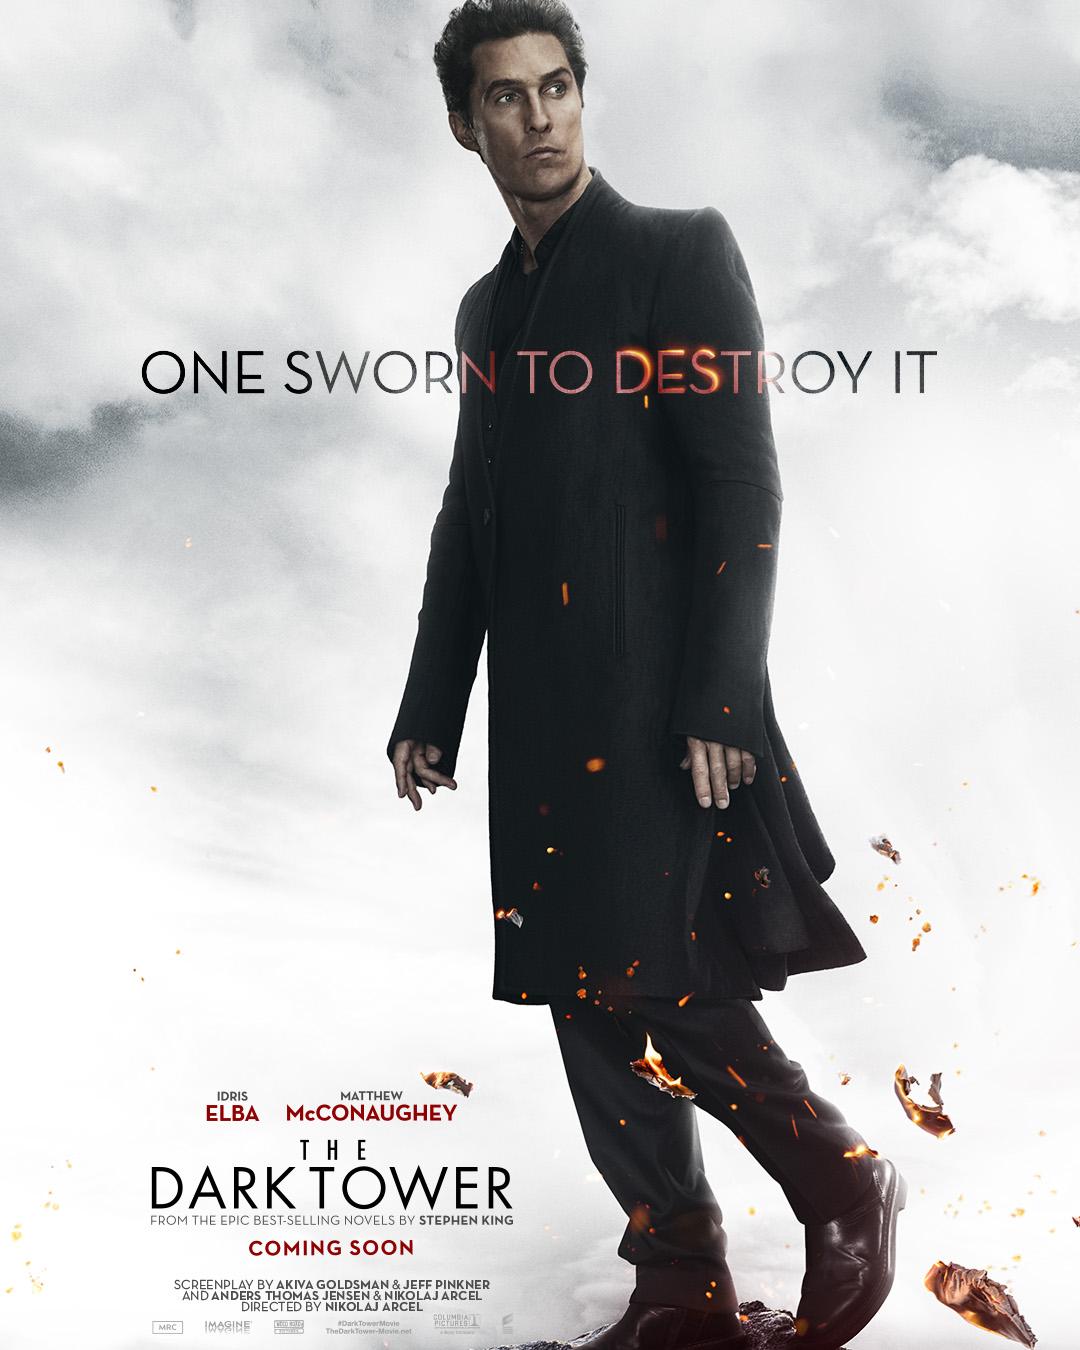 dark tower posters mcconaughey